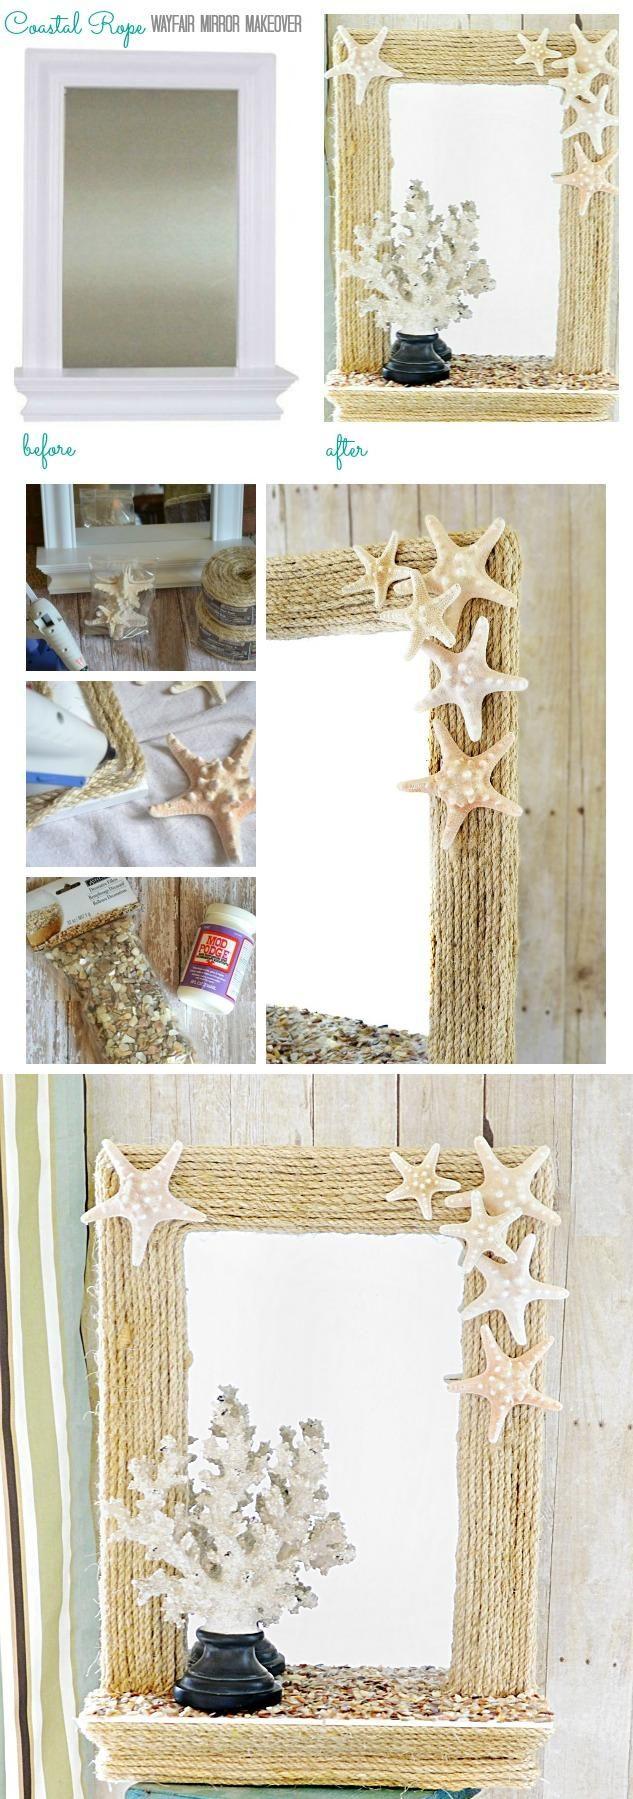 Be Creative: DIY Home Decor Ideas DIY Coastal Rope Mirror Makeover